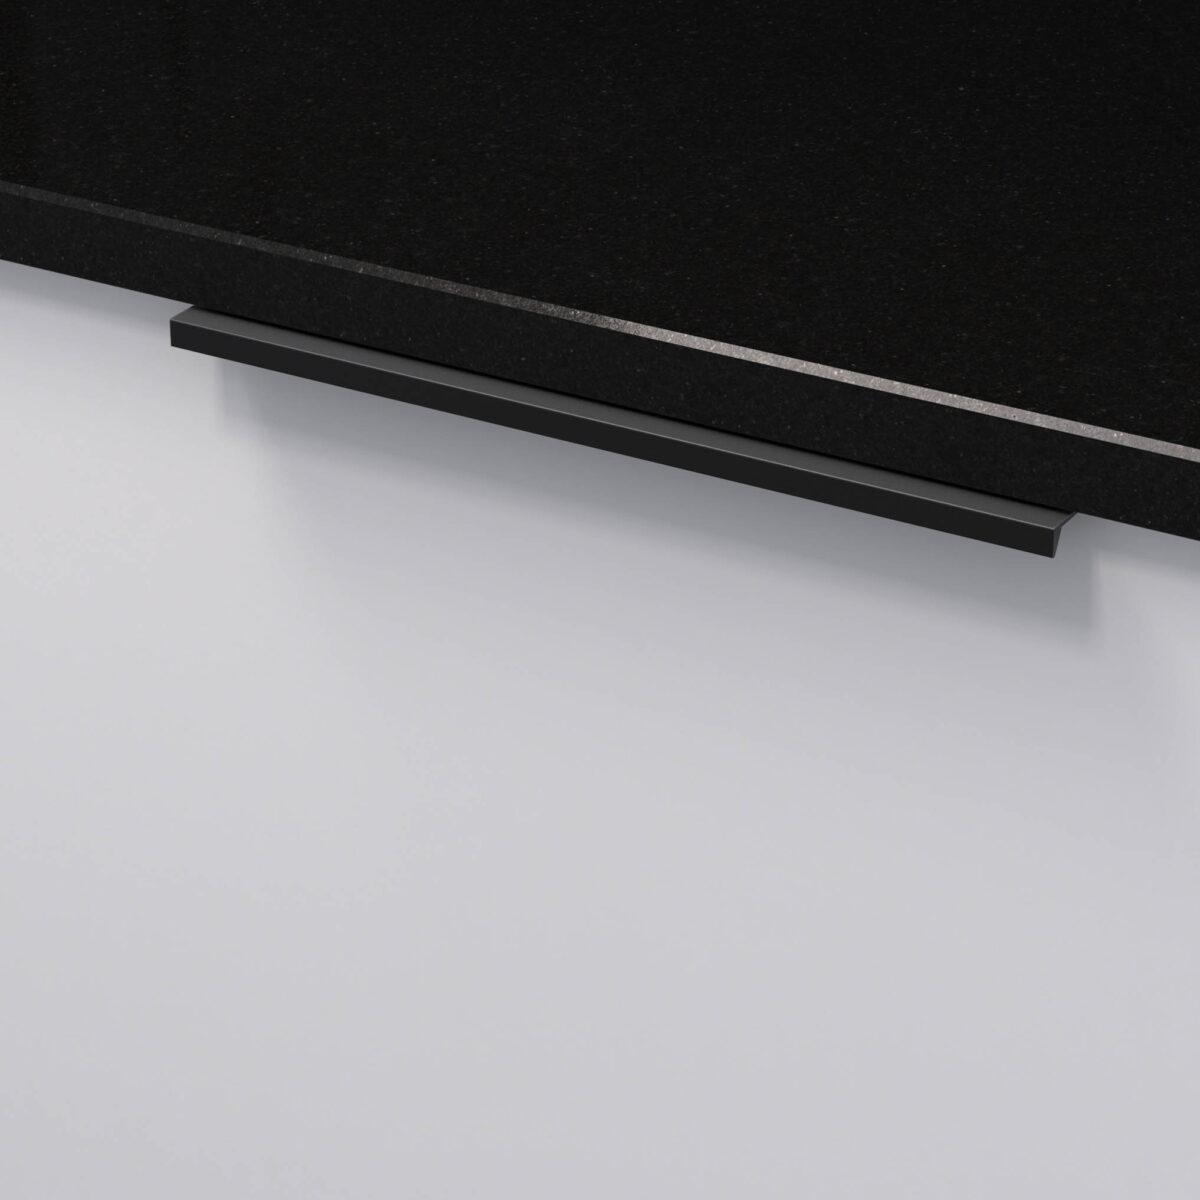 Profilhandtag slim 4025 matt svart 305196 11 232 mm ncs s 0300 n granit svart 2